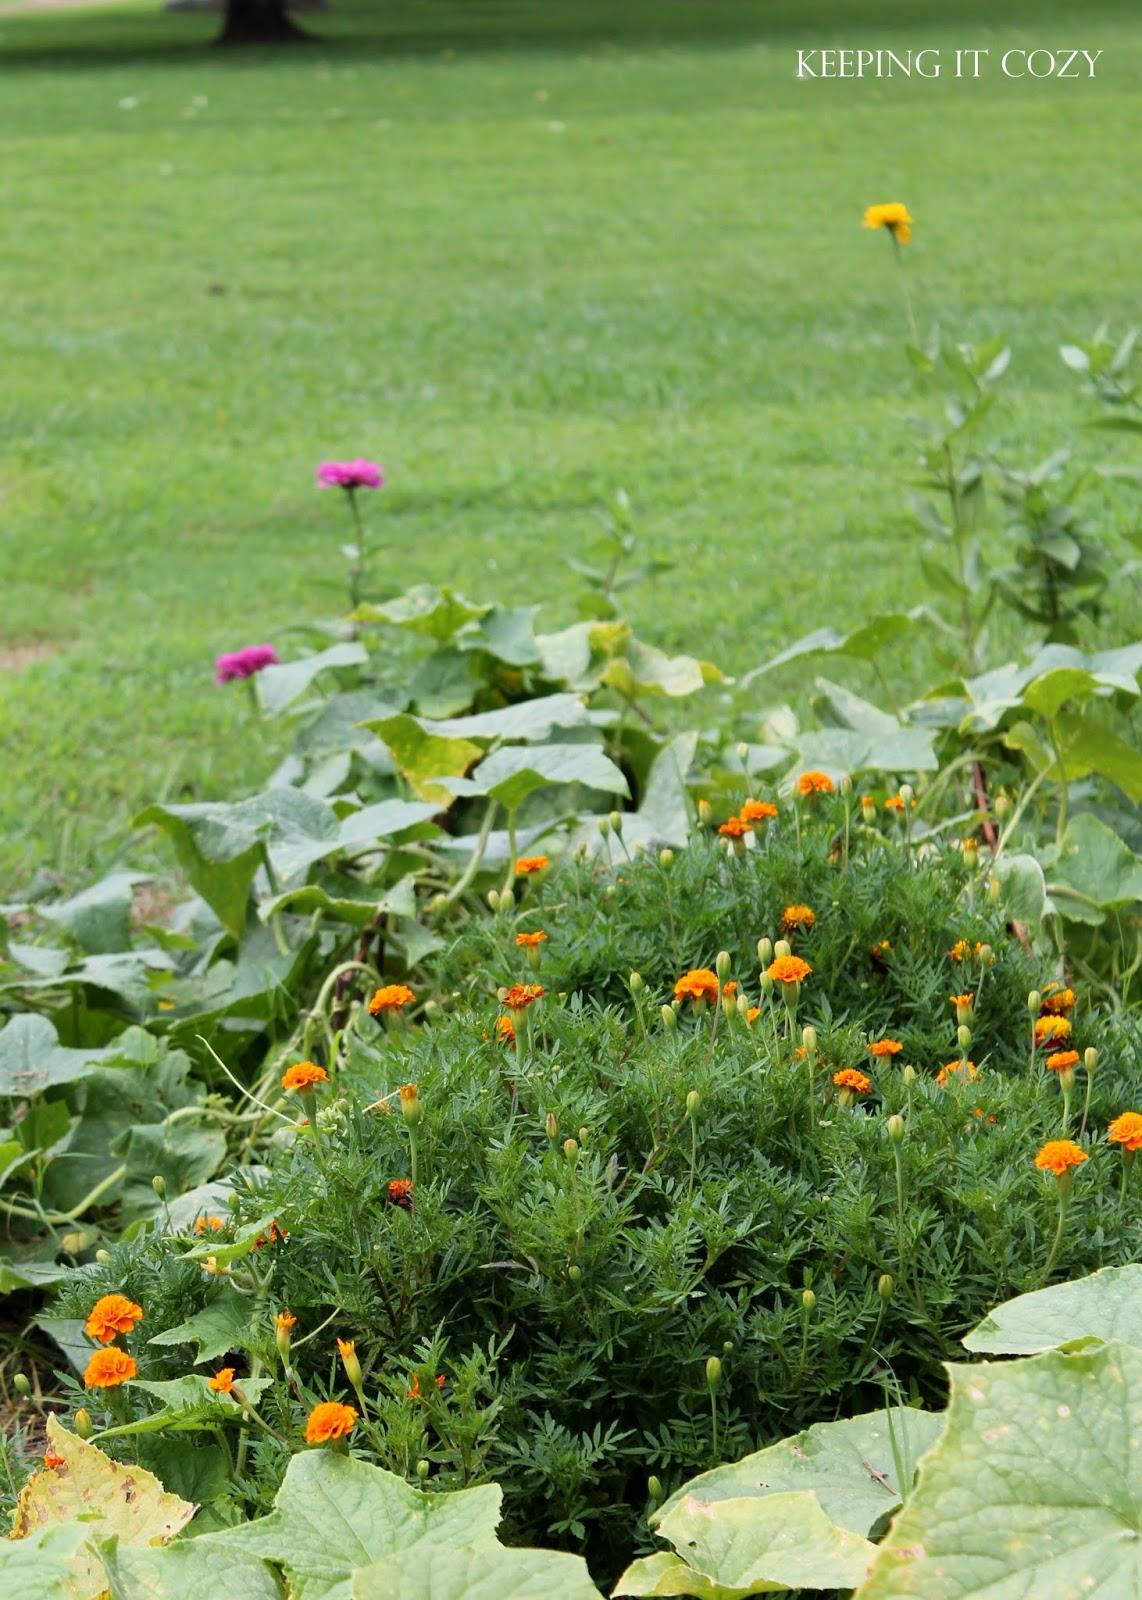 Keeping It Cozy: In The Garden on